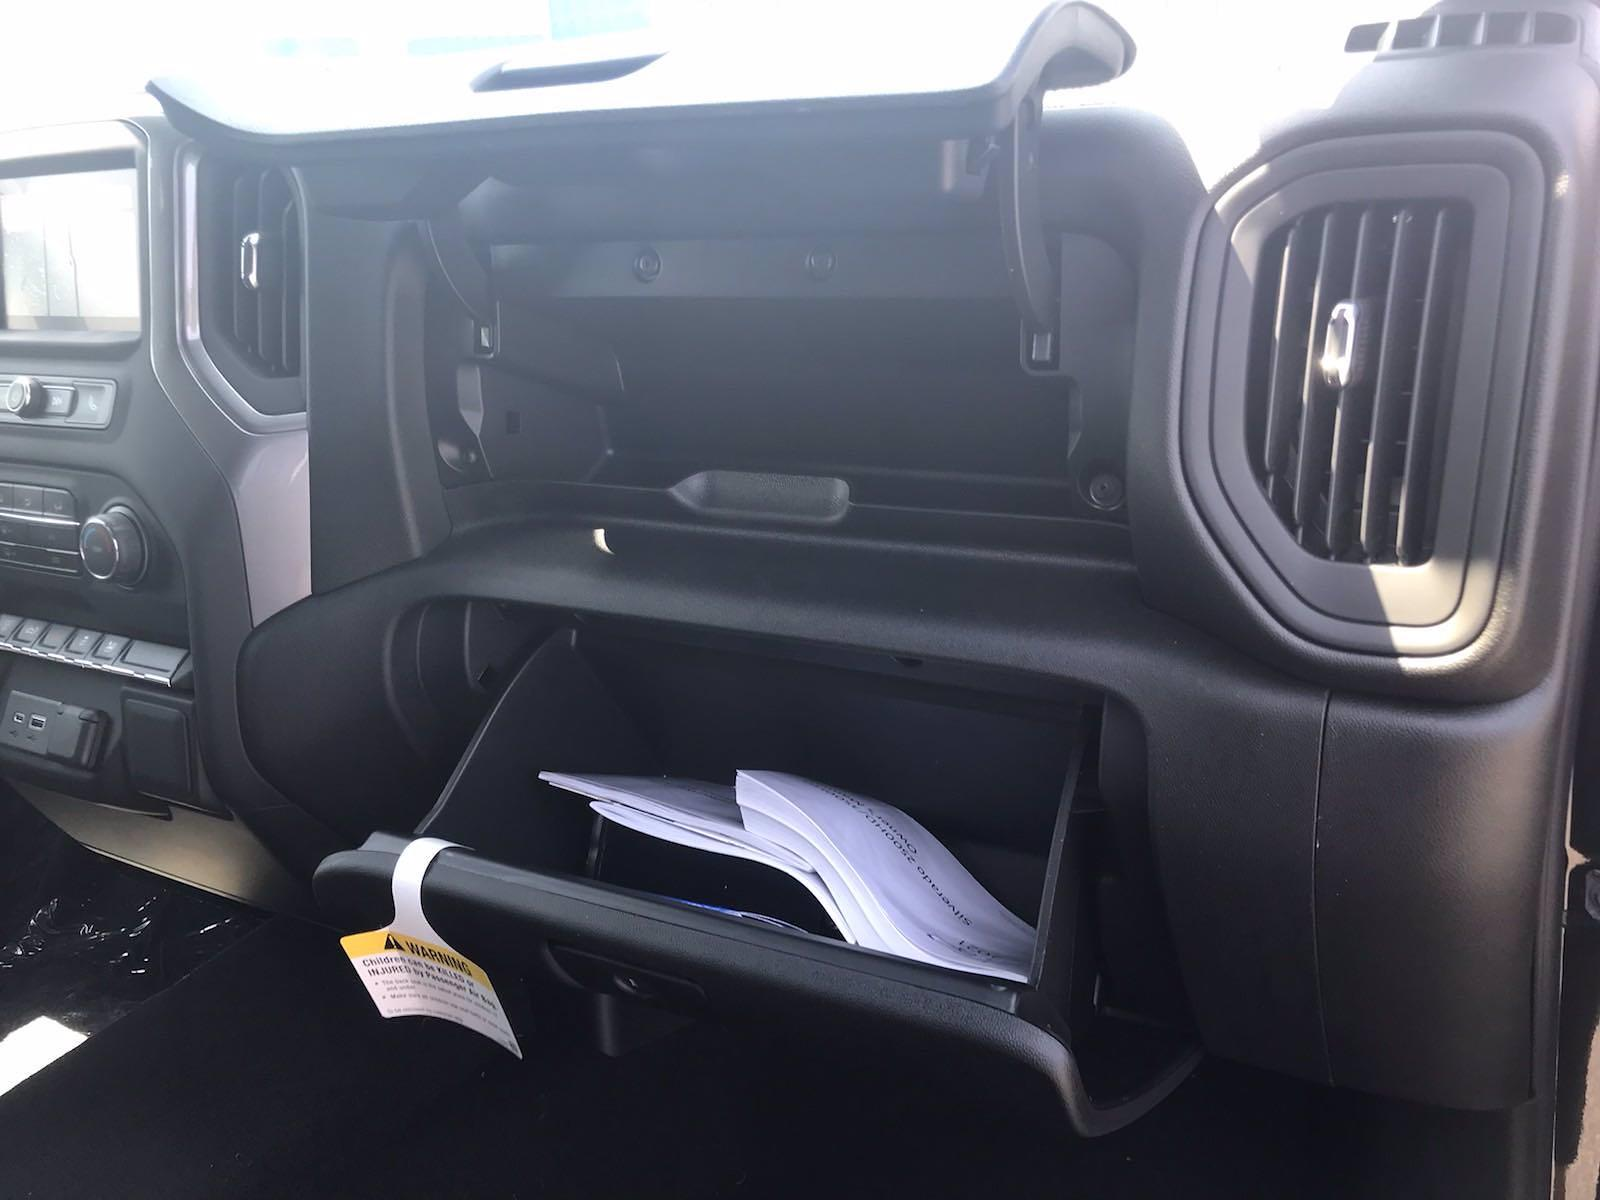 2021 Chevrolet Silverado 2500 Crew Cab 4x4, Pickup #217330 - photo 35